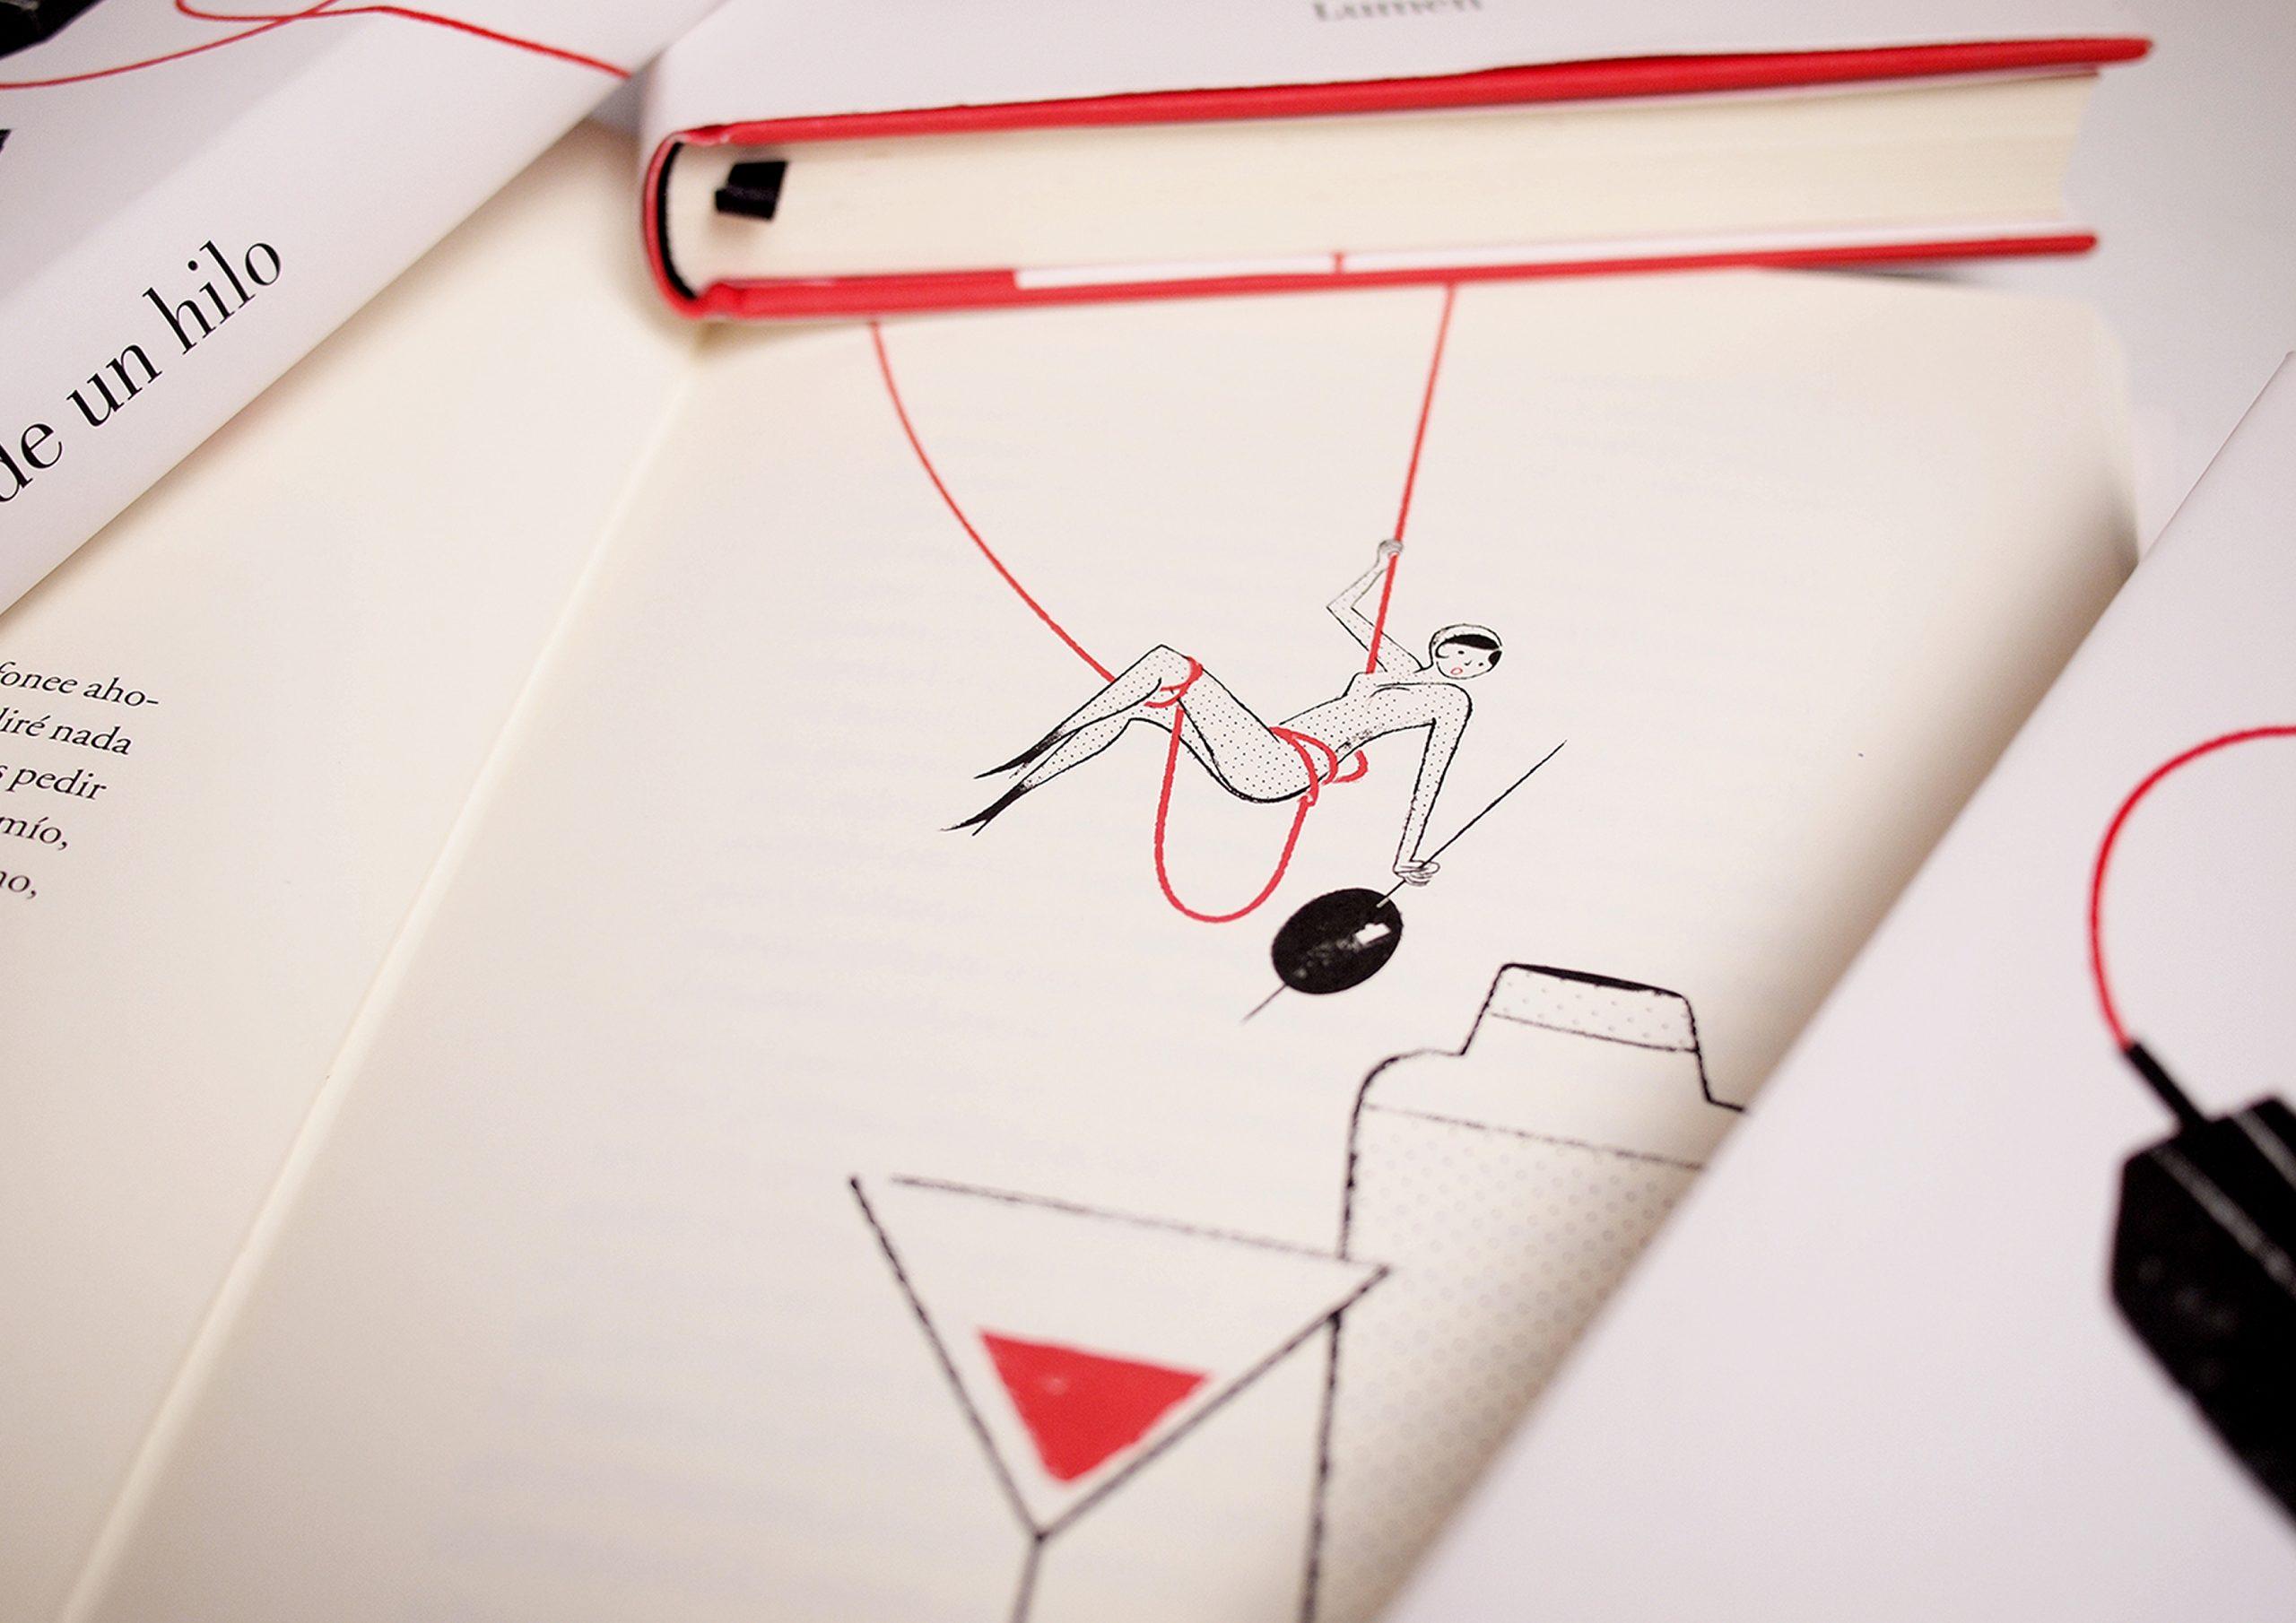 Portfolio review for illustrators with Simone Massoni